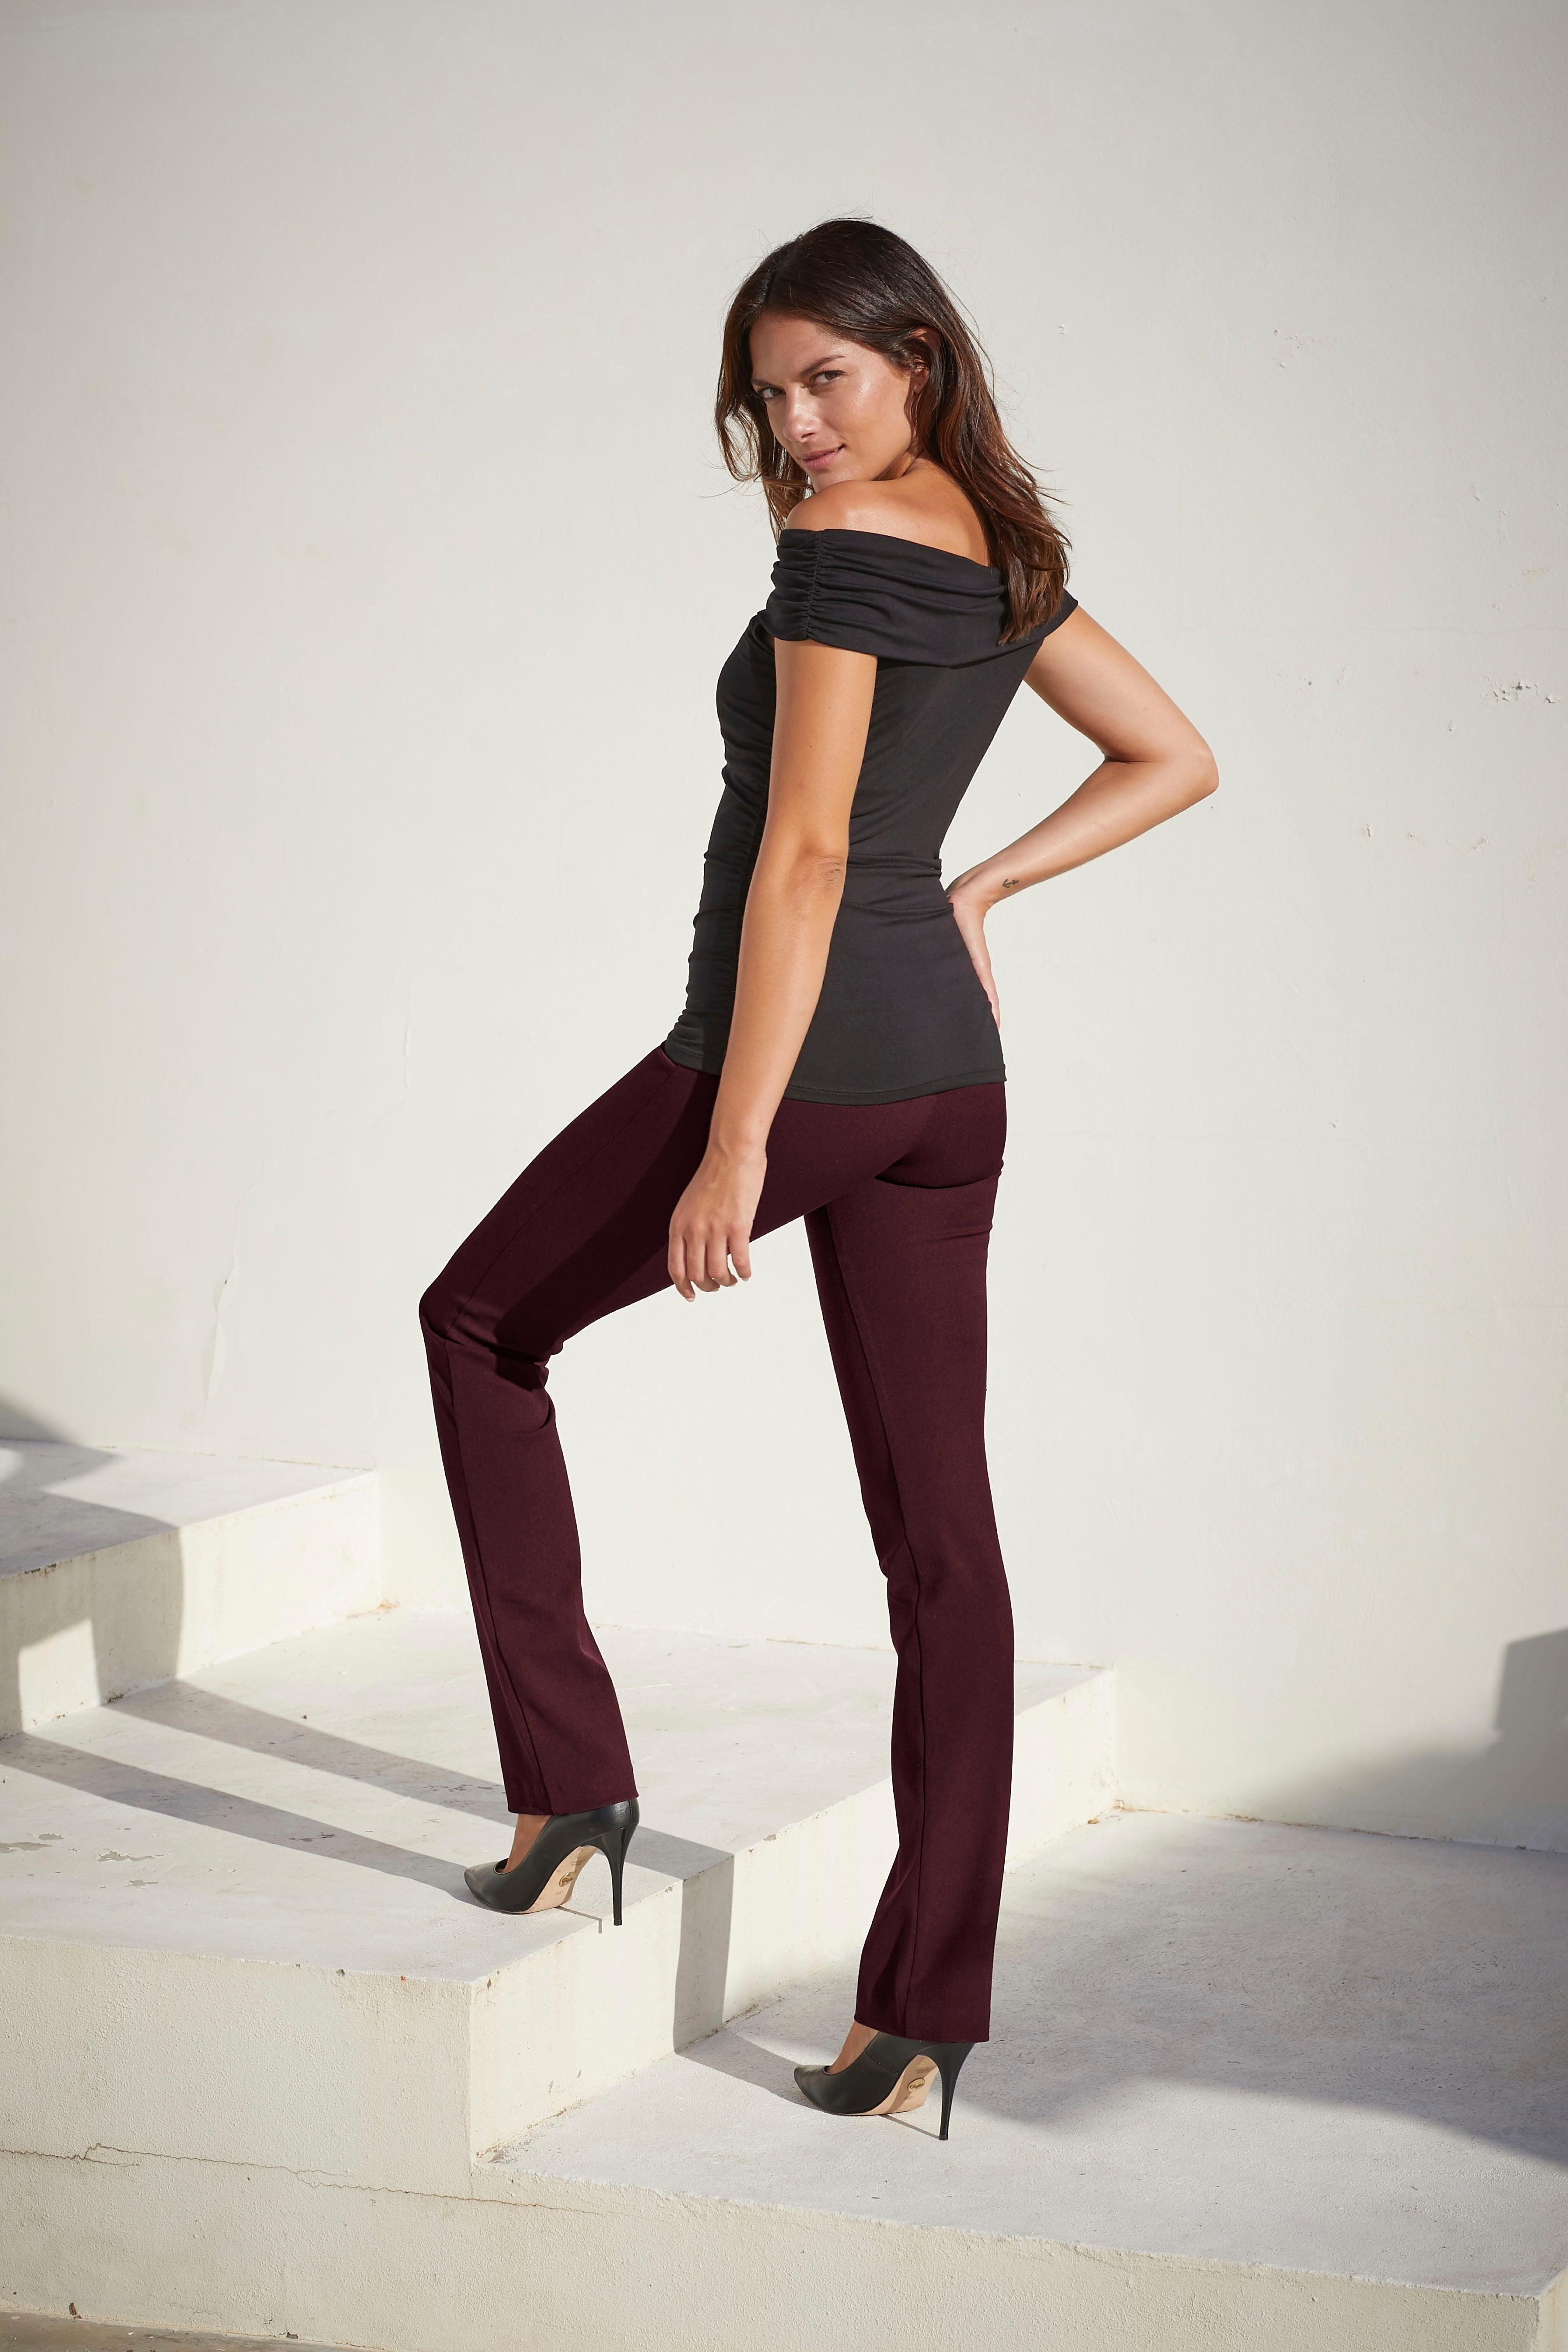 Bodyright Shaping »shaping« Integriertem Carmenshirt einsatz Mit gfSgraUq